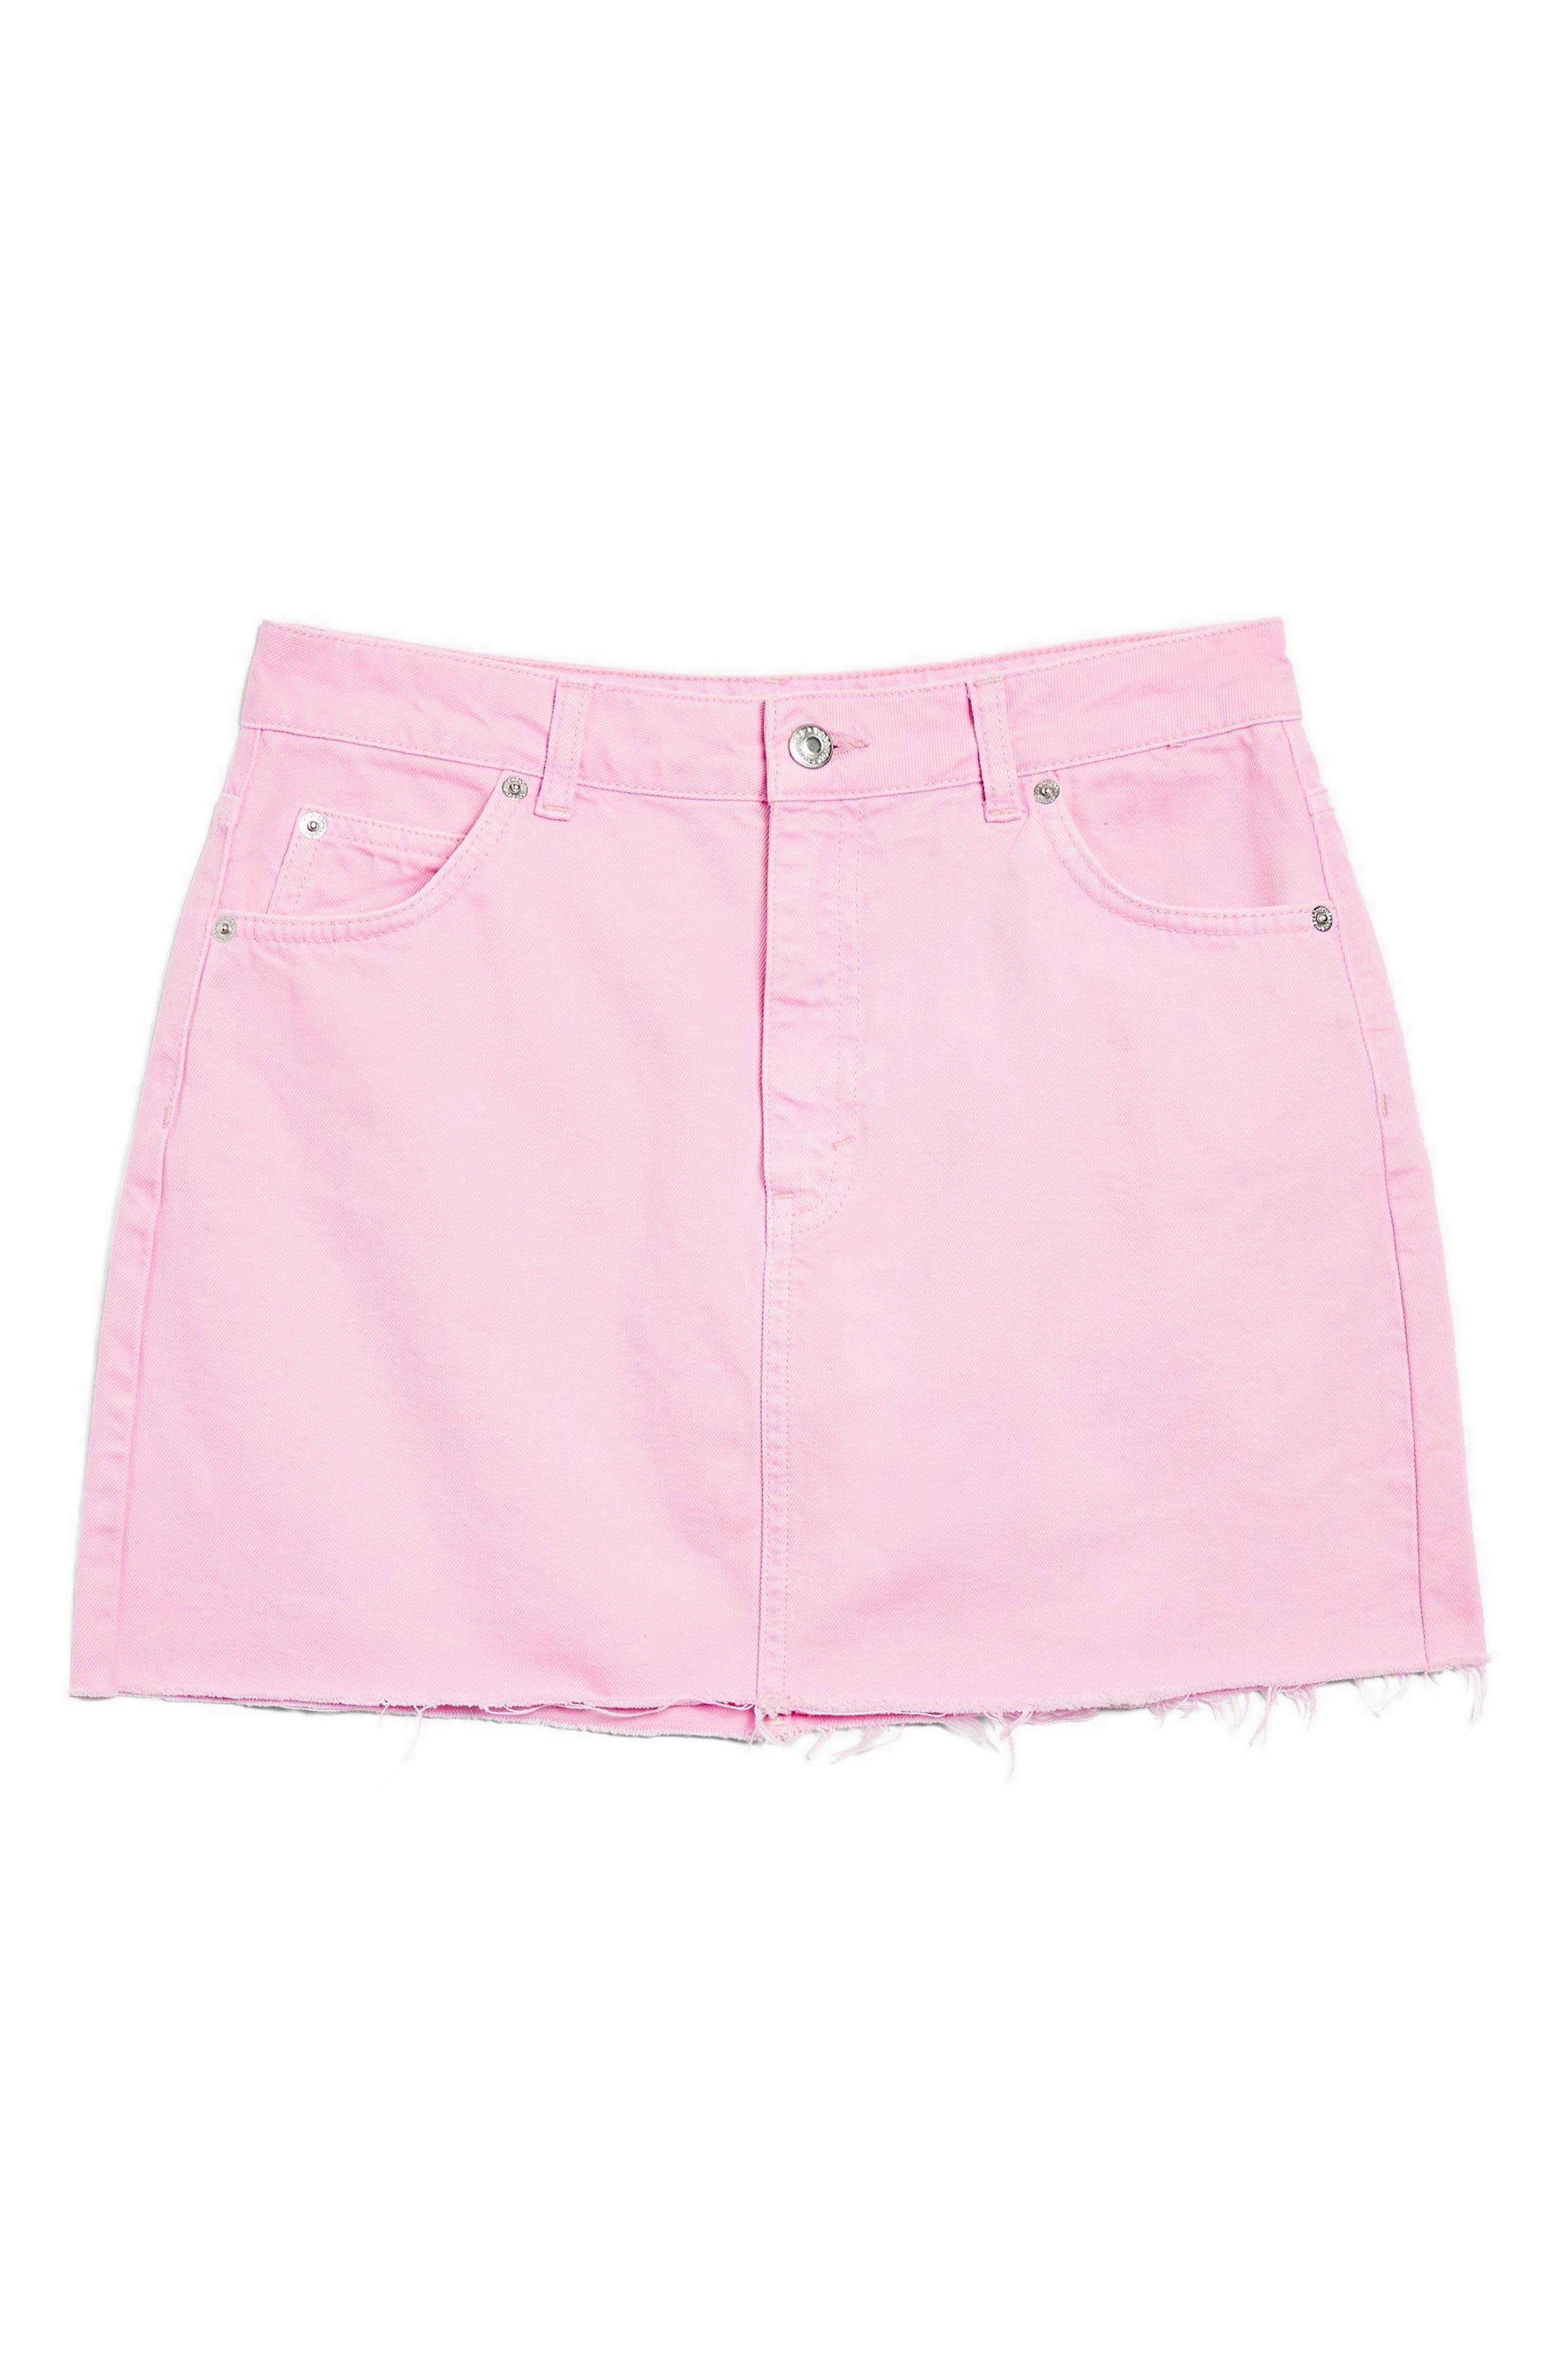 MOTO High Waist Denim Skirt,                             Alternate thumbnail 3, color,                             BUBBLEGUM